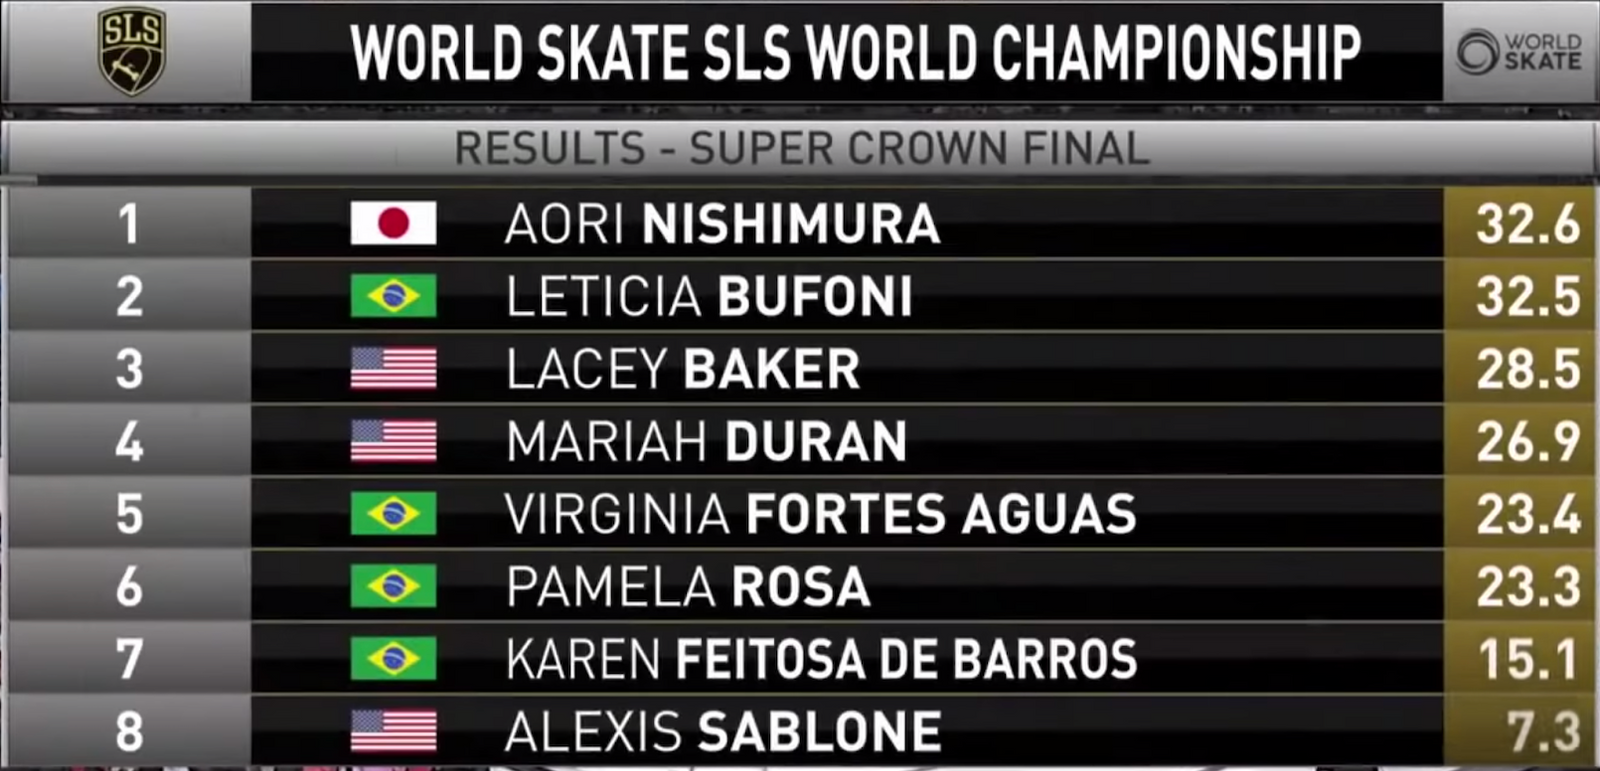 WATCH FULL STREAM OF SLS WORLD CHAMPIONSHIP WOMEN'S FINALS